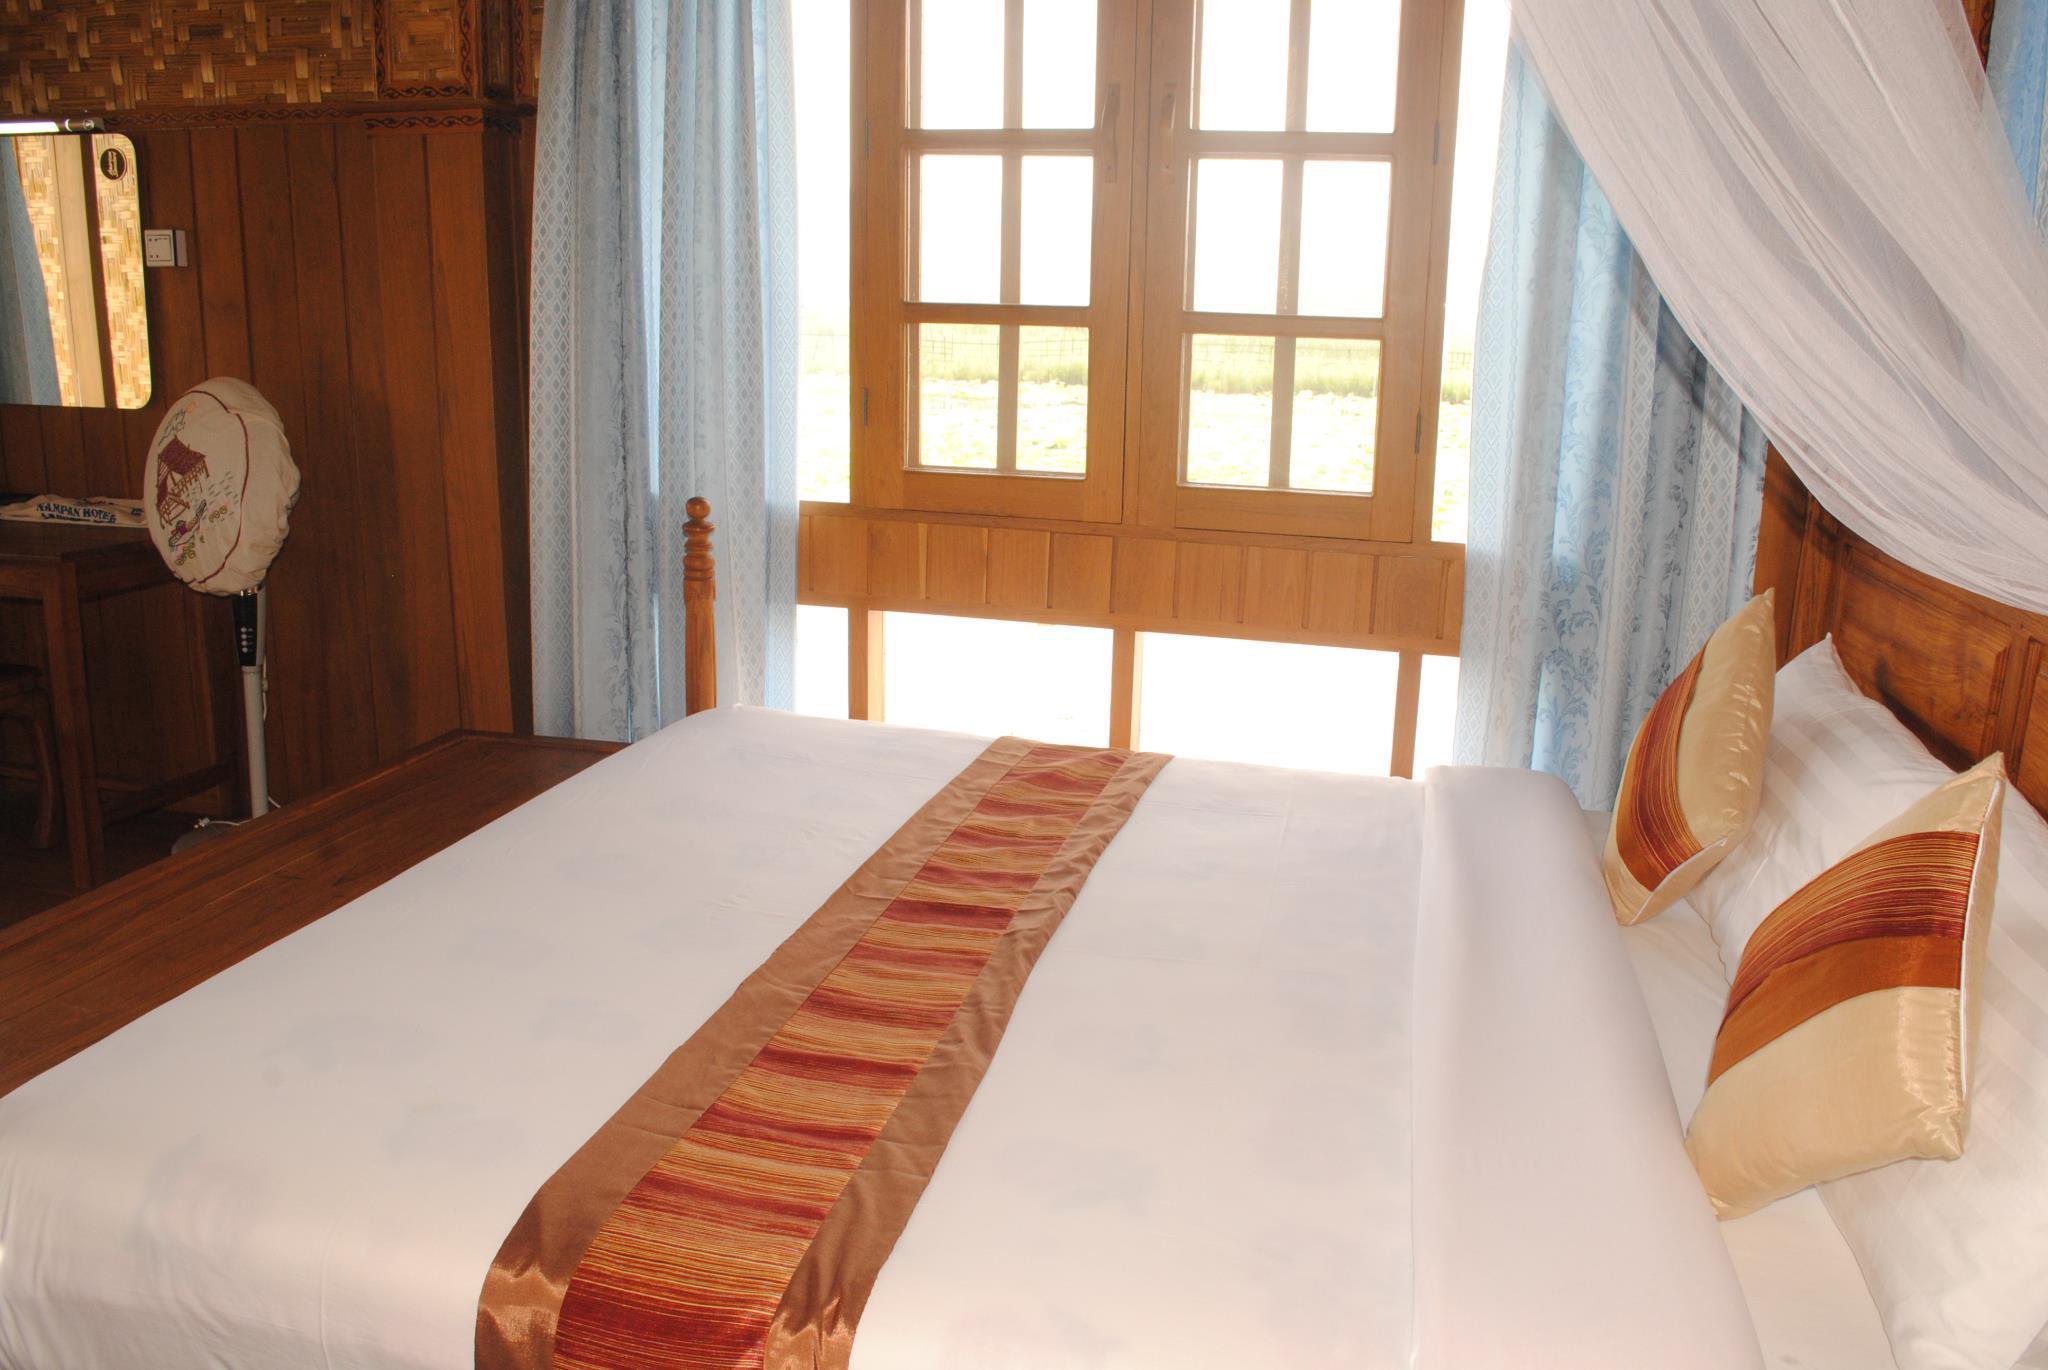 Golden Island Cottages Nampan Hotel, Taunggye